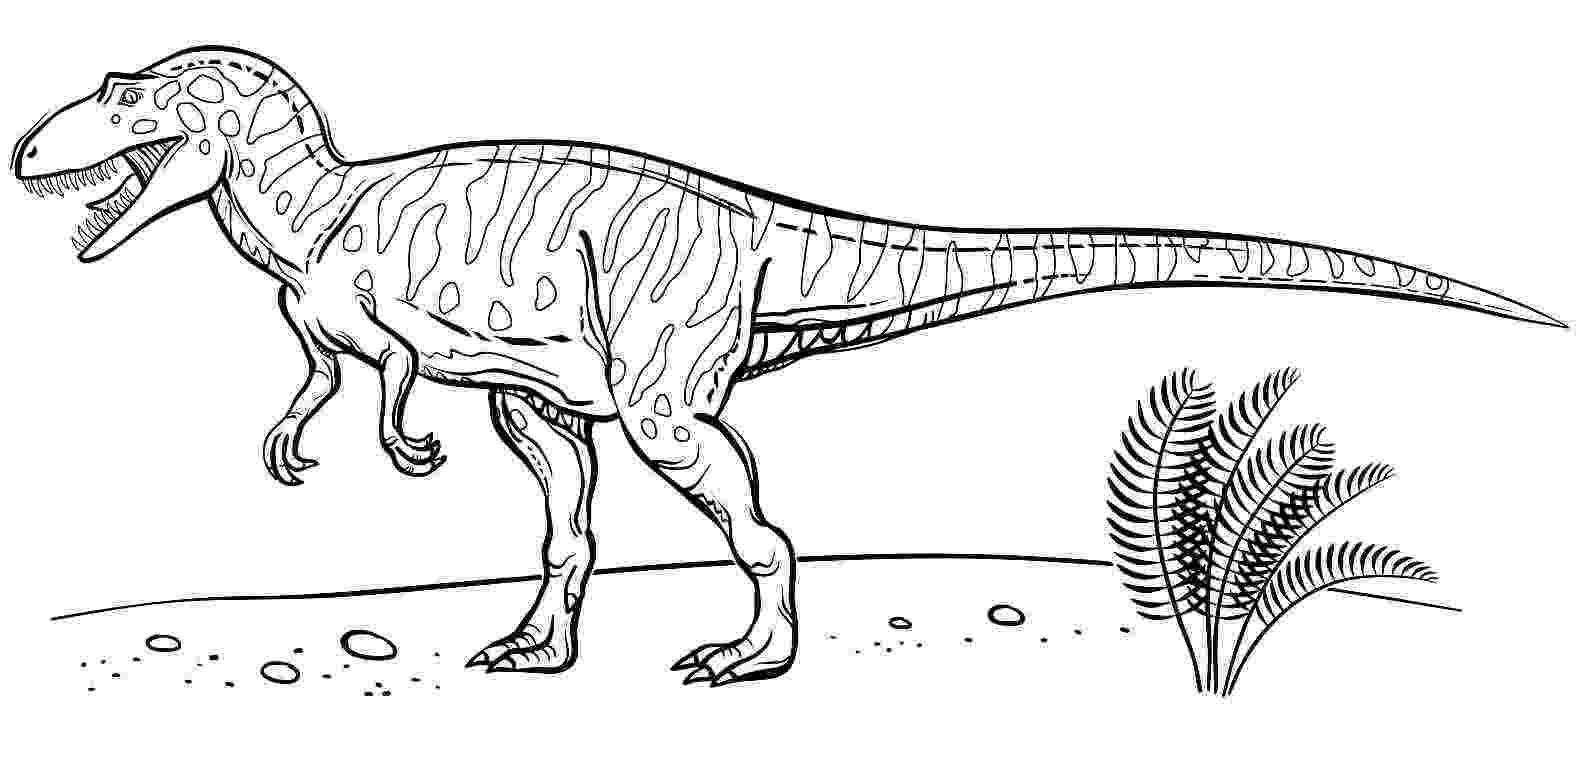 velociraptor pictures velociraptor coloring pages coloring pages to download pictures velociraptor